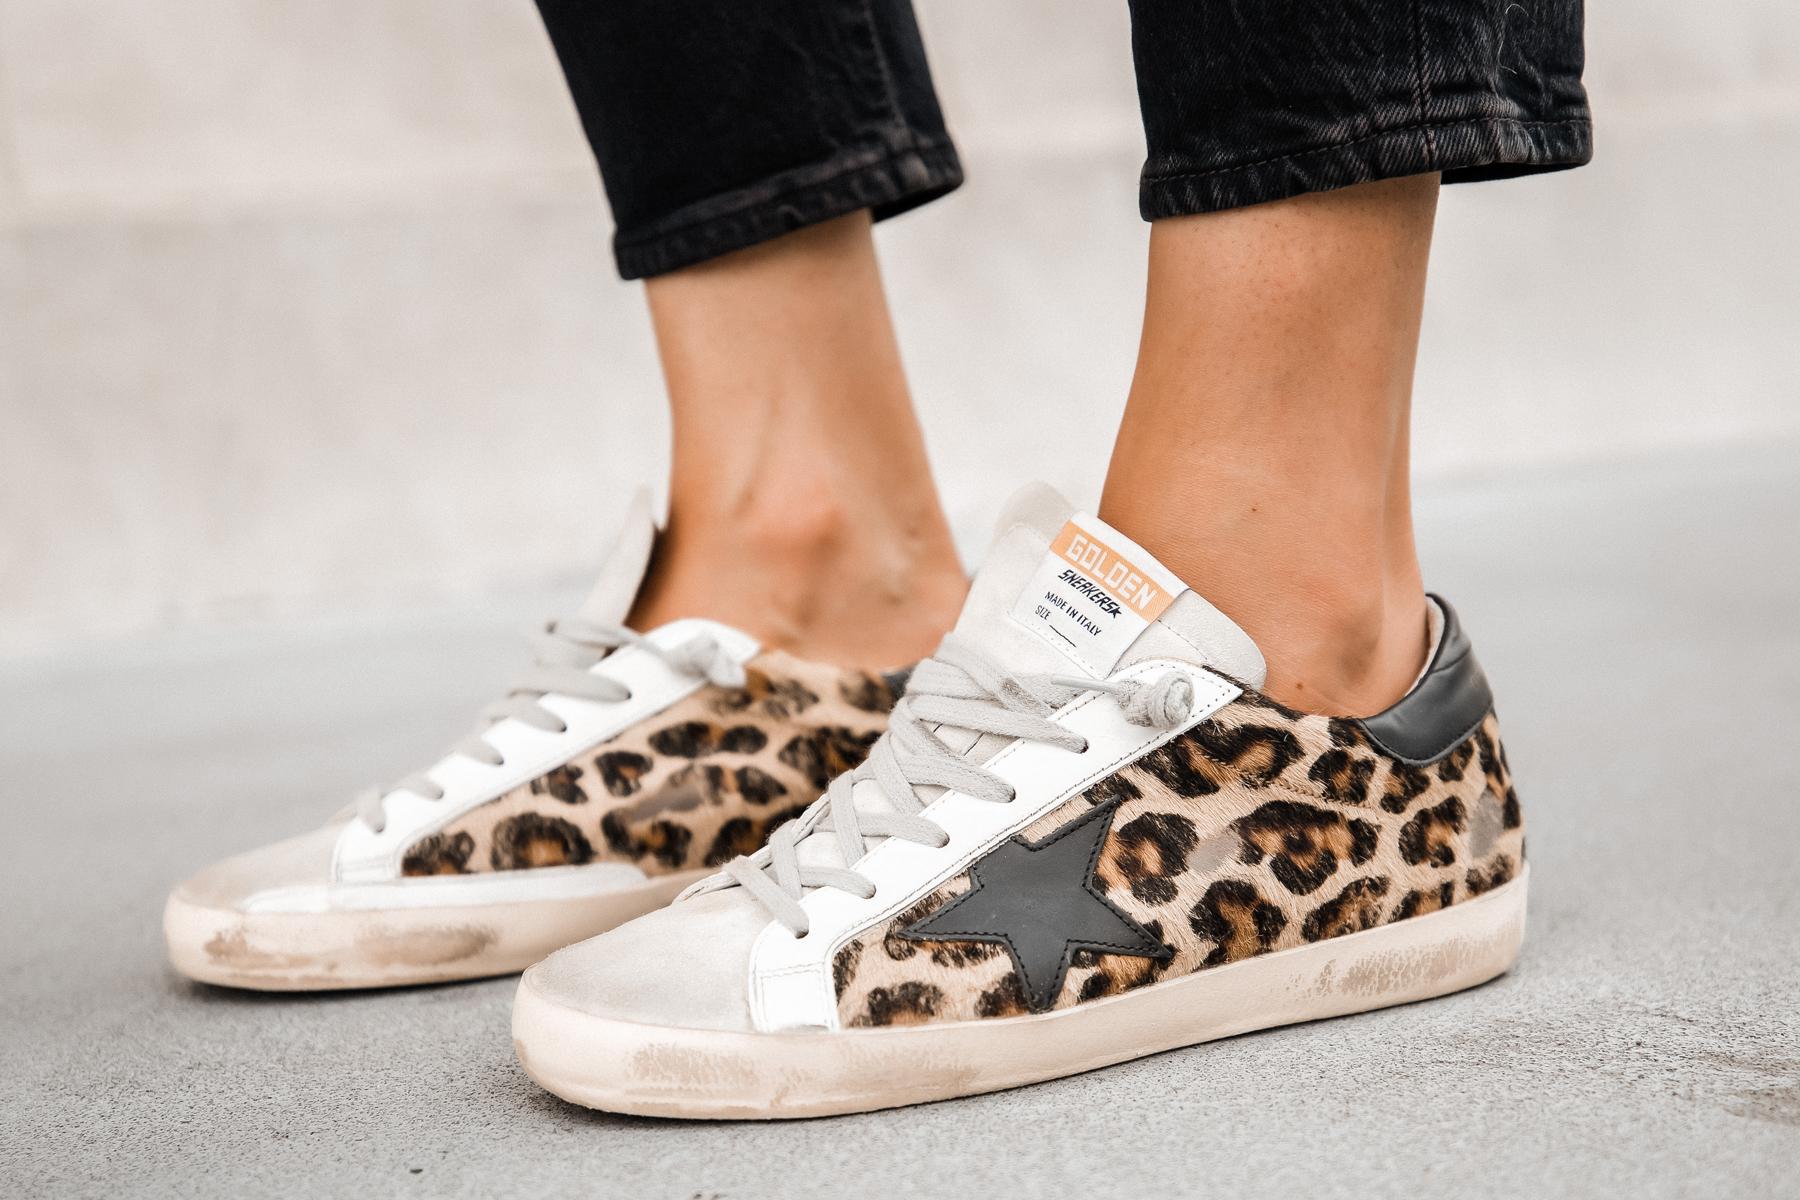 Fashion Jackson Wearing Golden Goose Superstar Sneakers Leopard